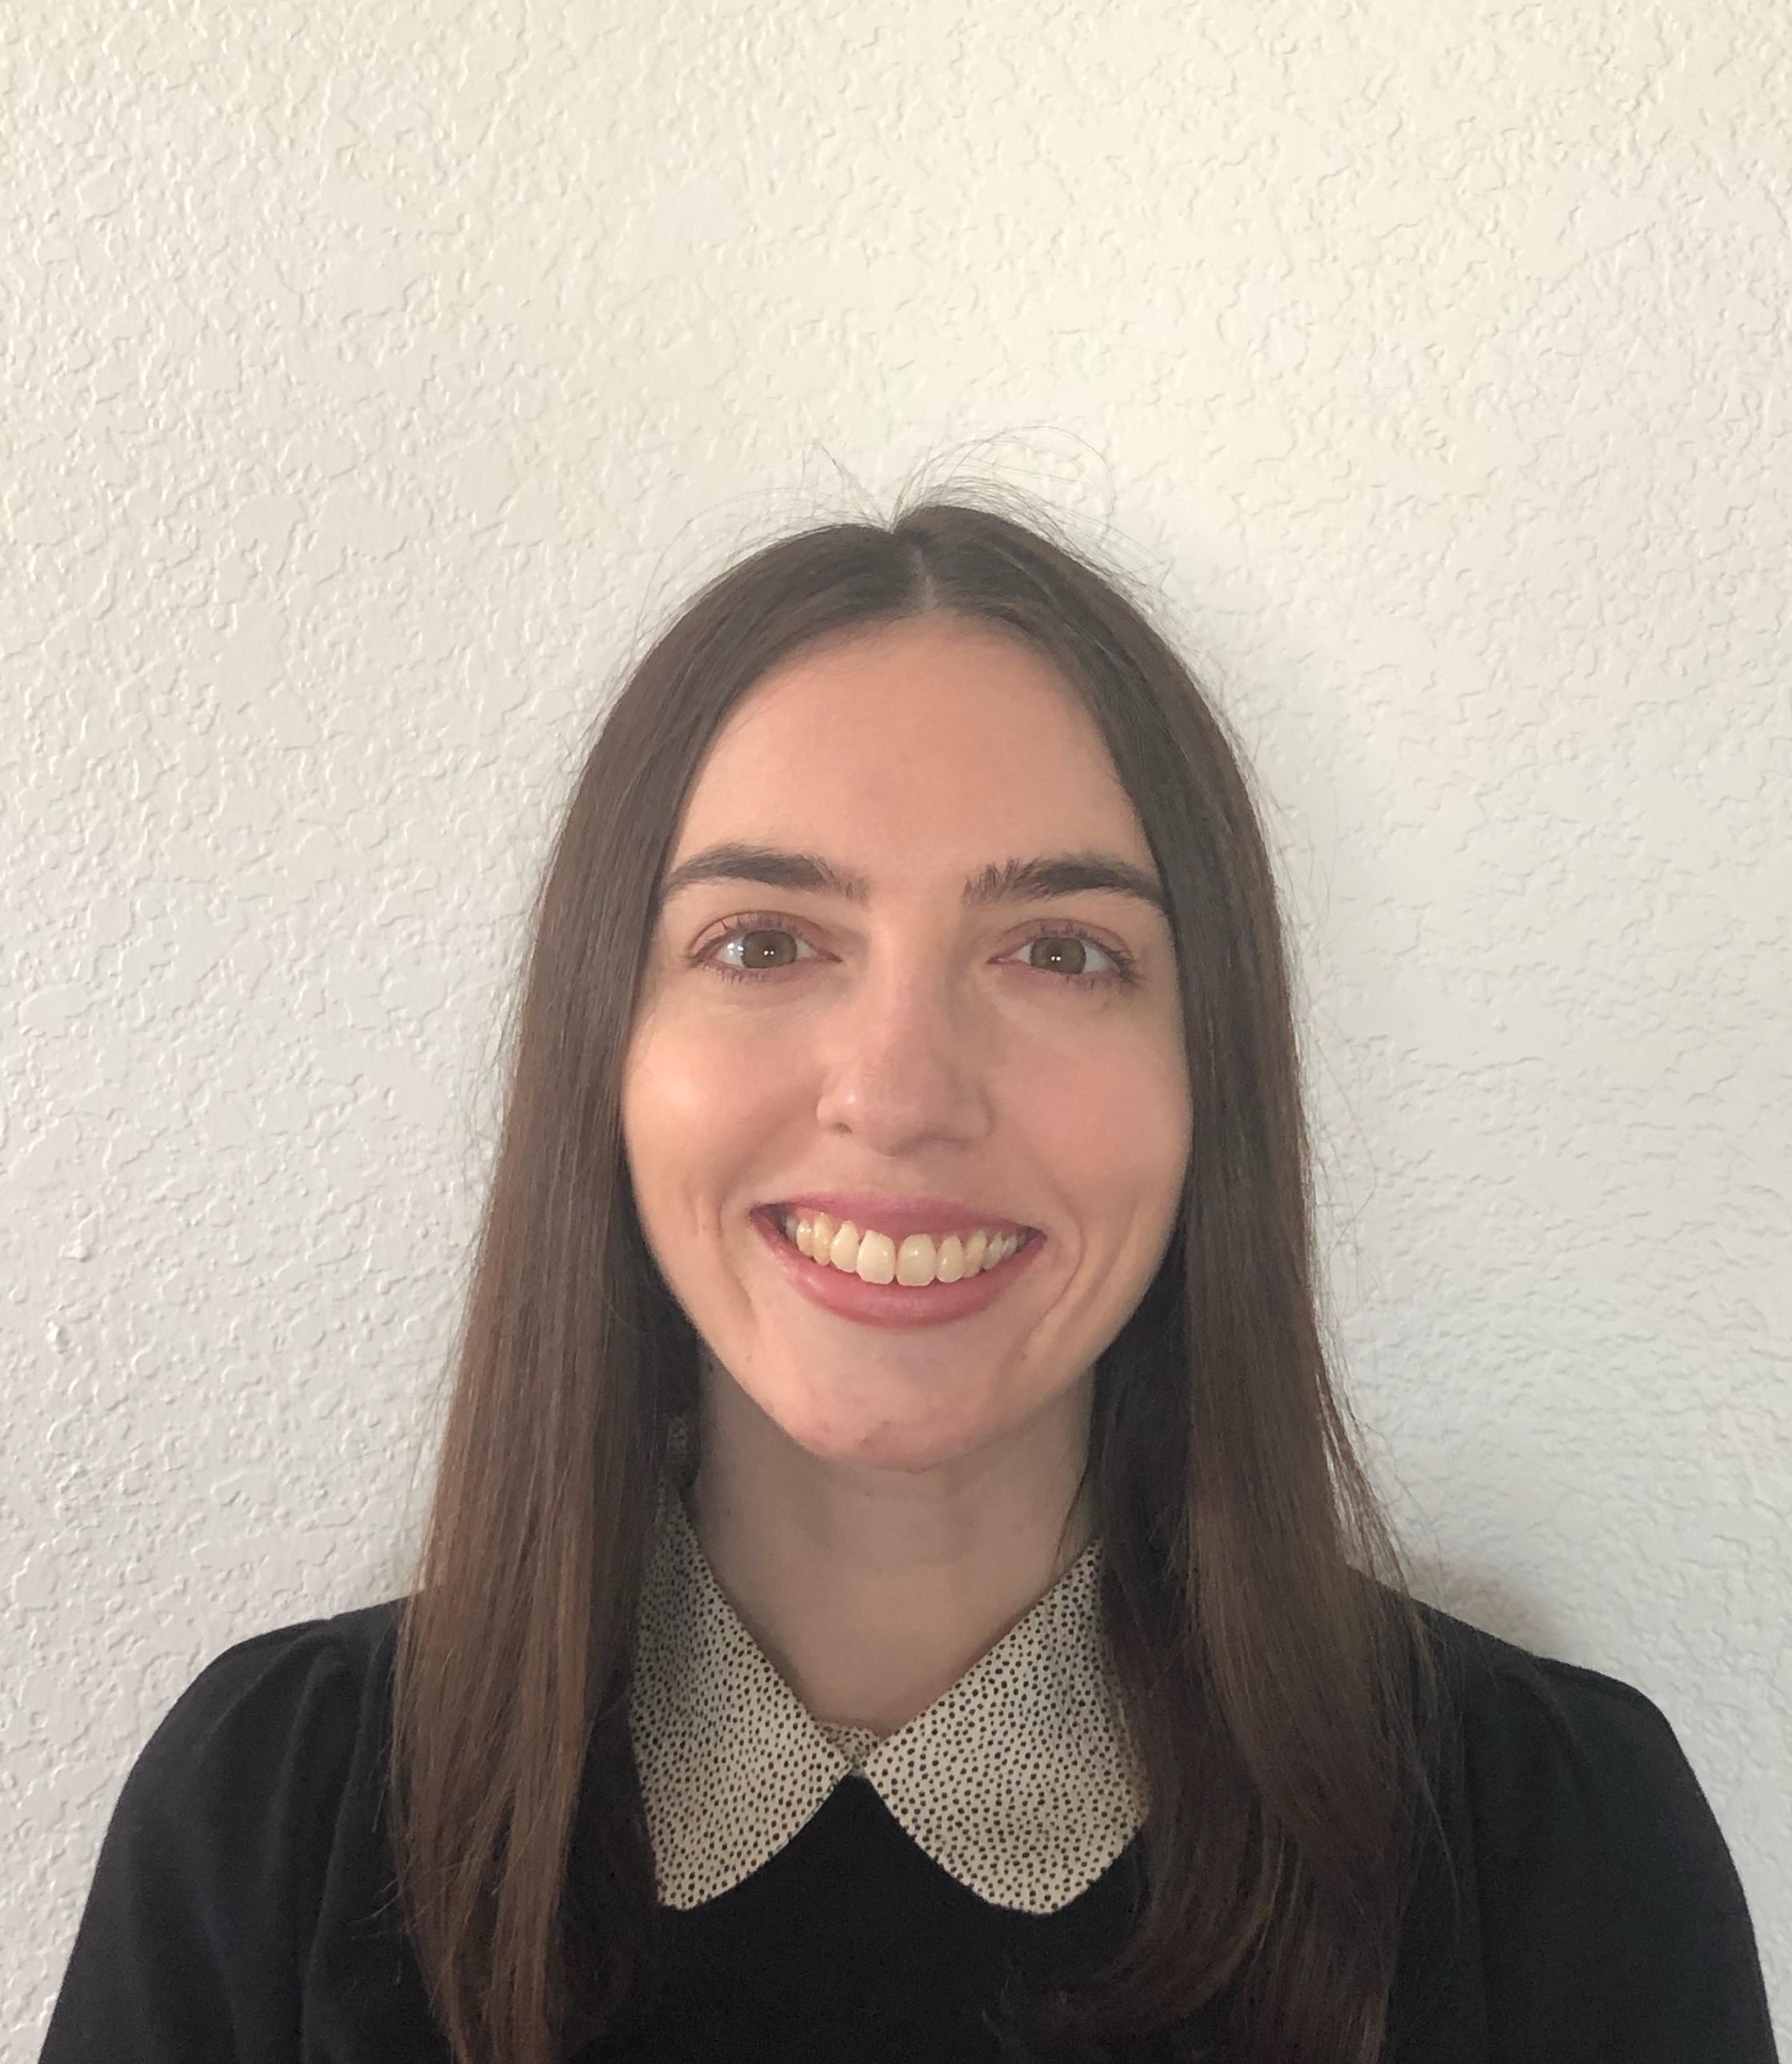 Profile image of Lindsay